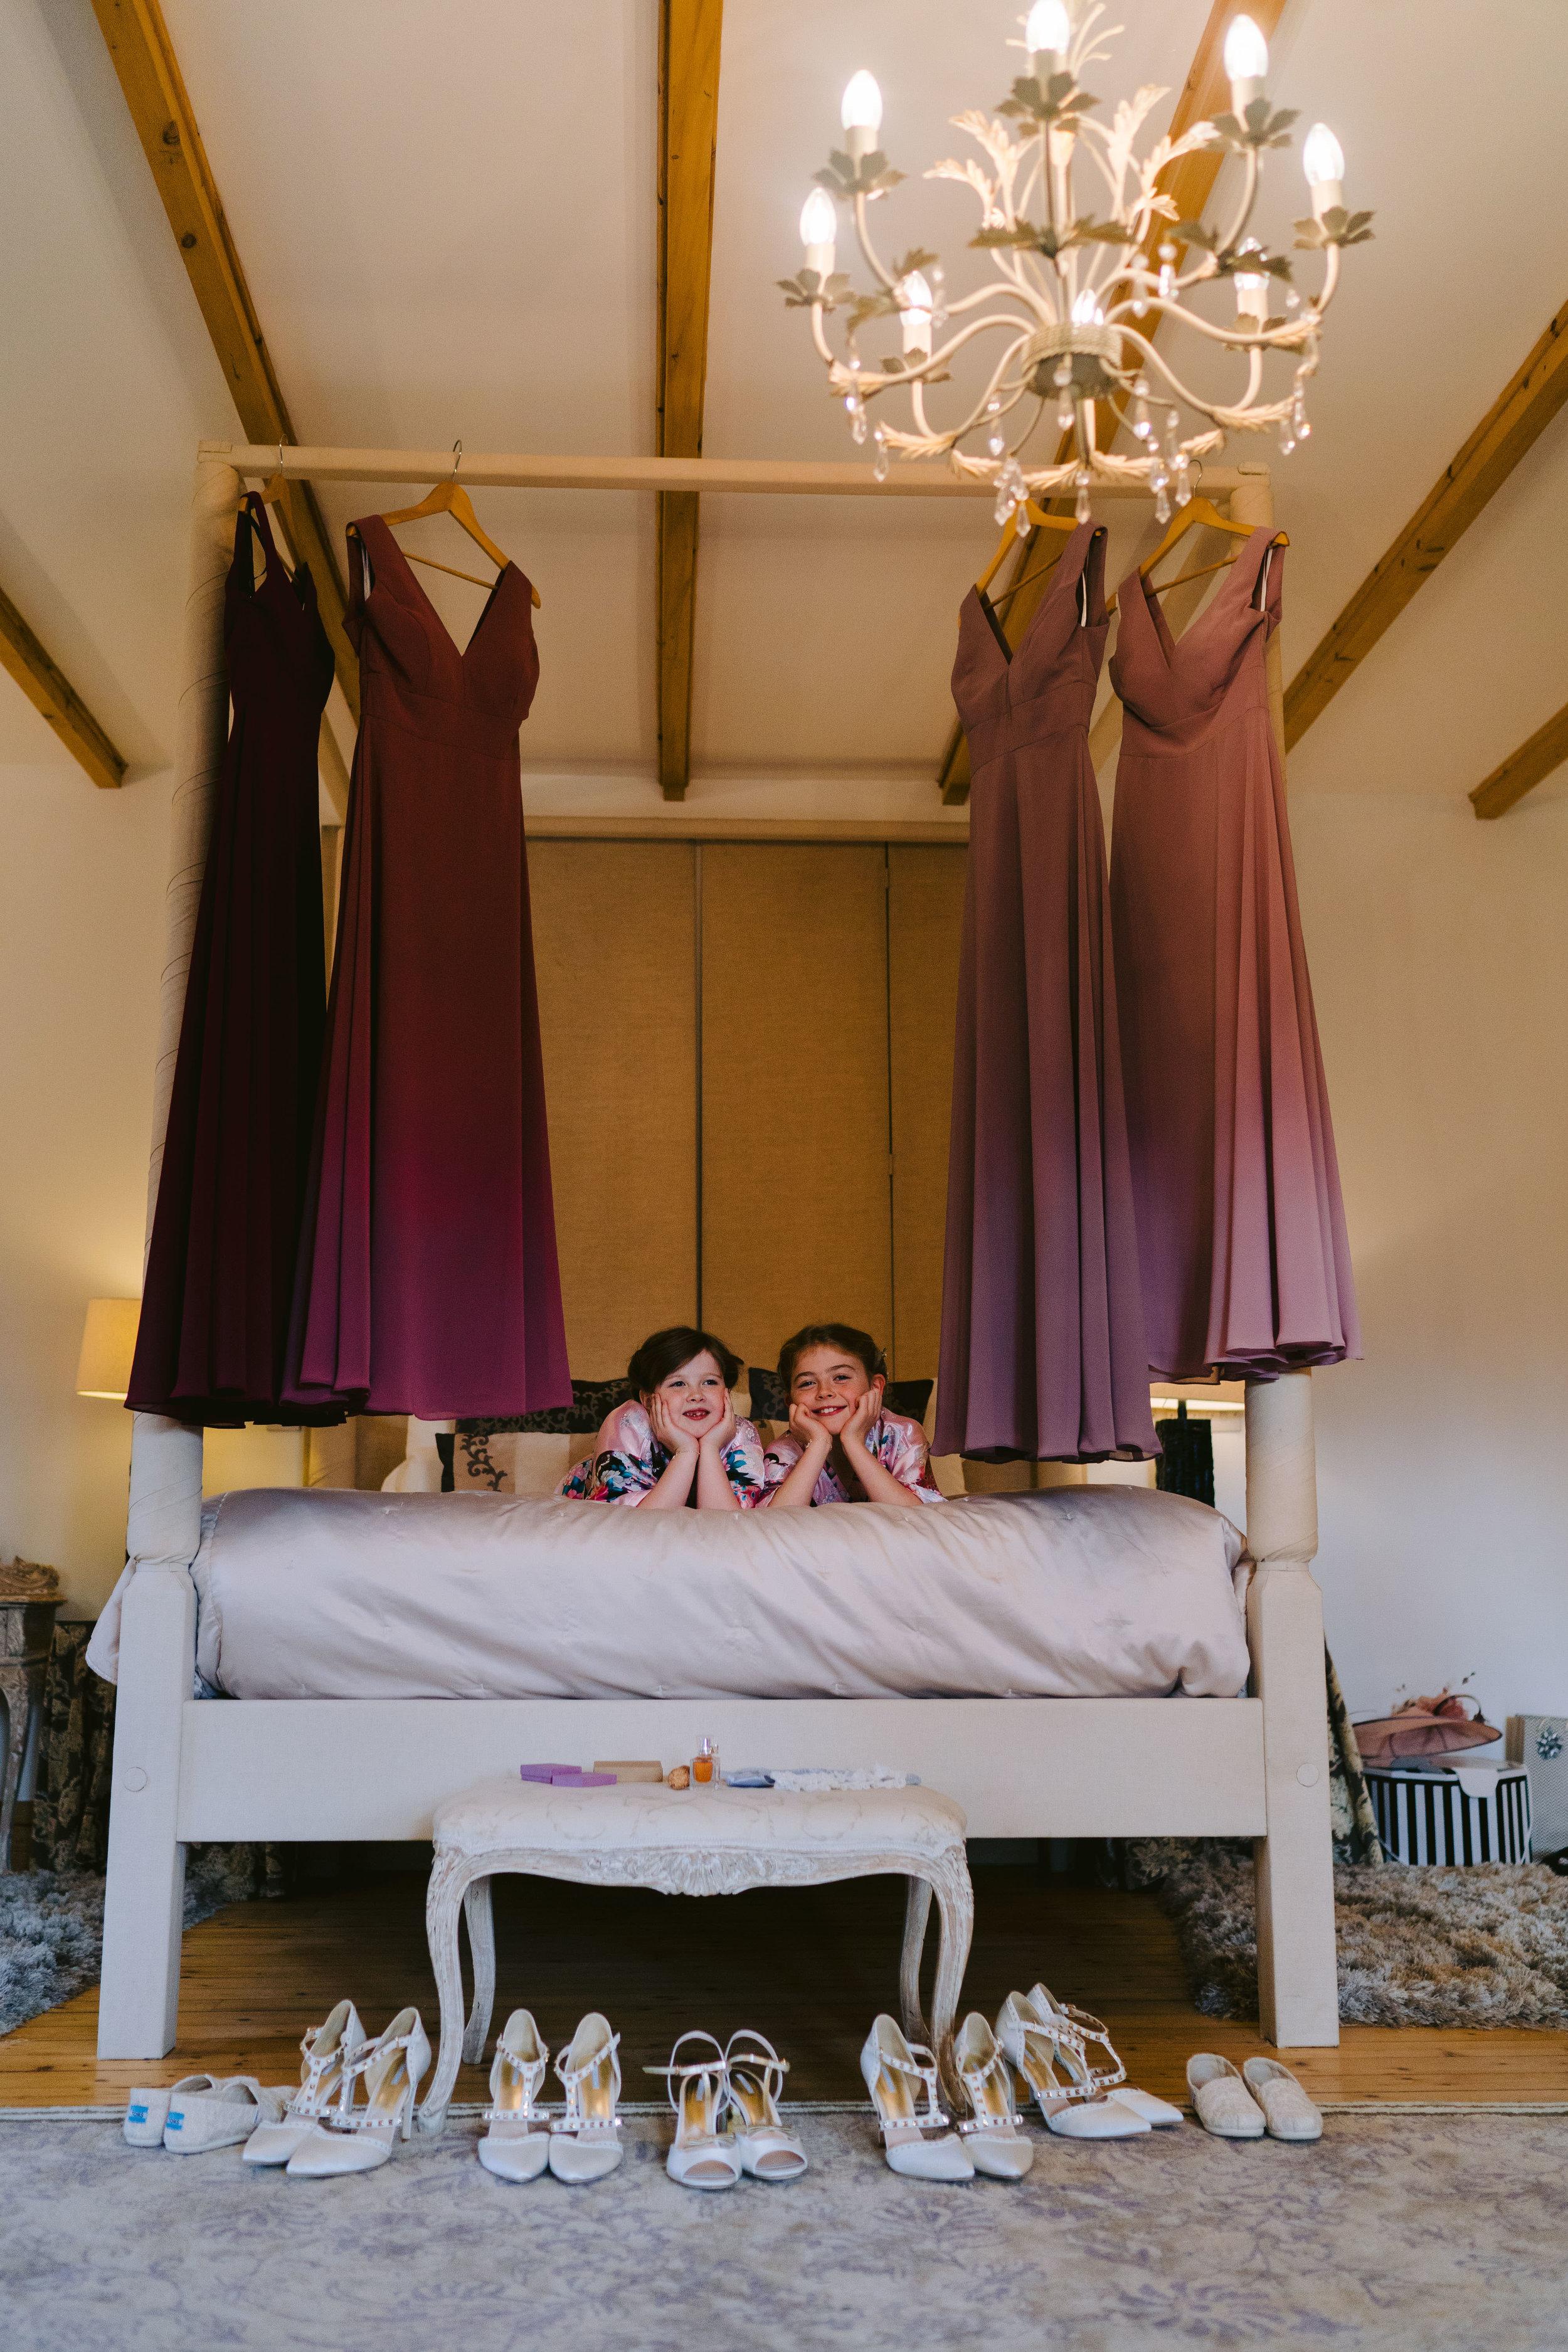 Karin_and_Shauns_Wedding_-_Achnagairn_Castle_-_www.eilidhrobertson.co.uk-128.jpg